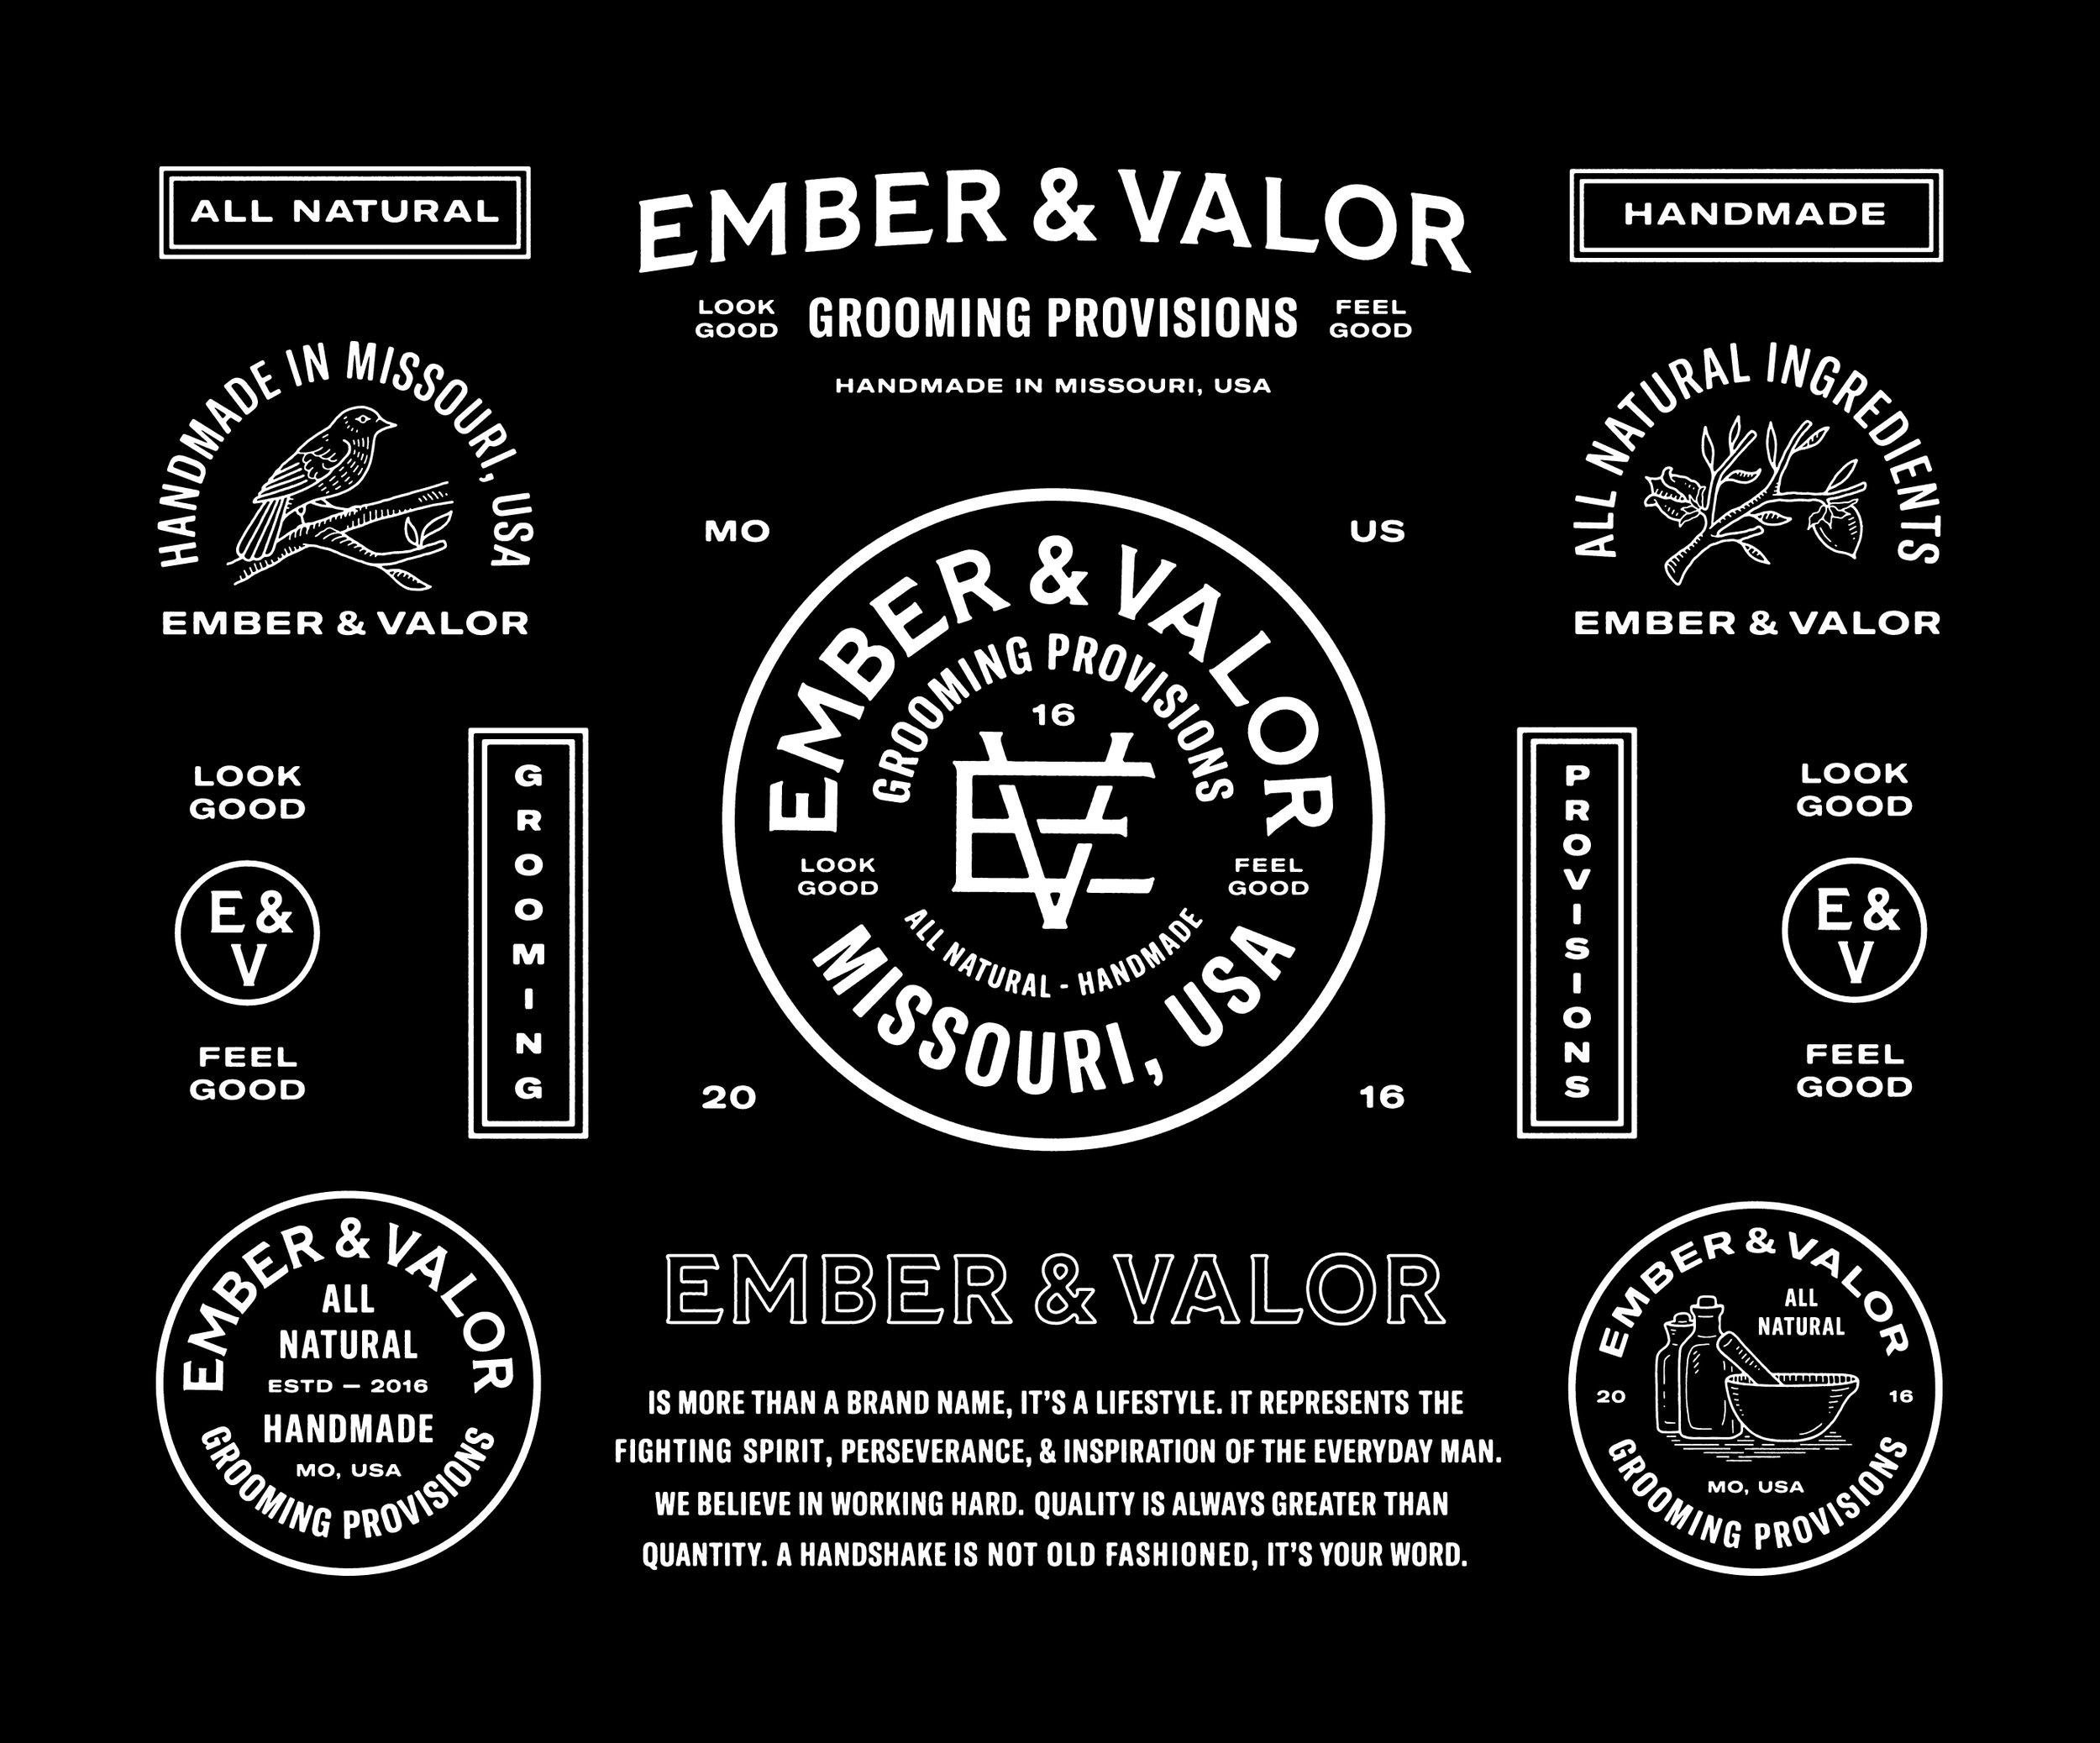 Studio Freight - Ember & Valor Identity Sheet